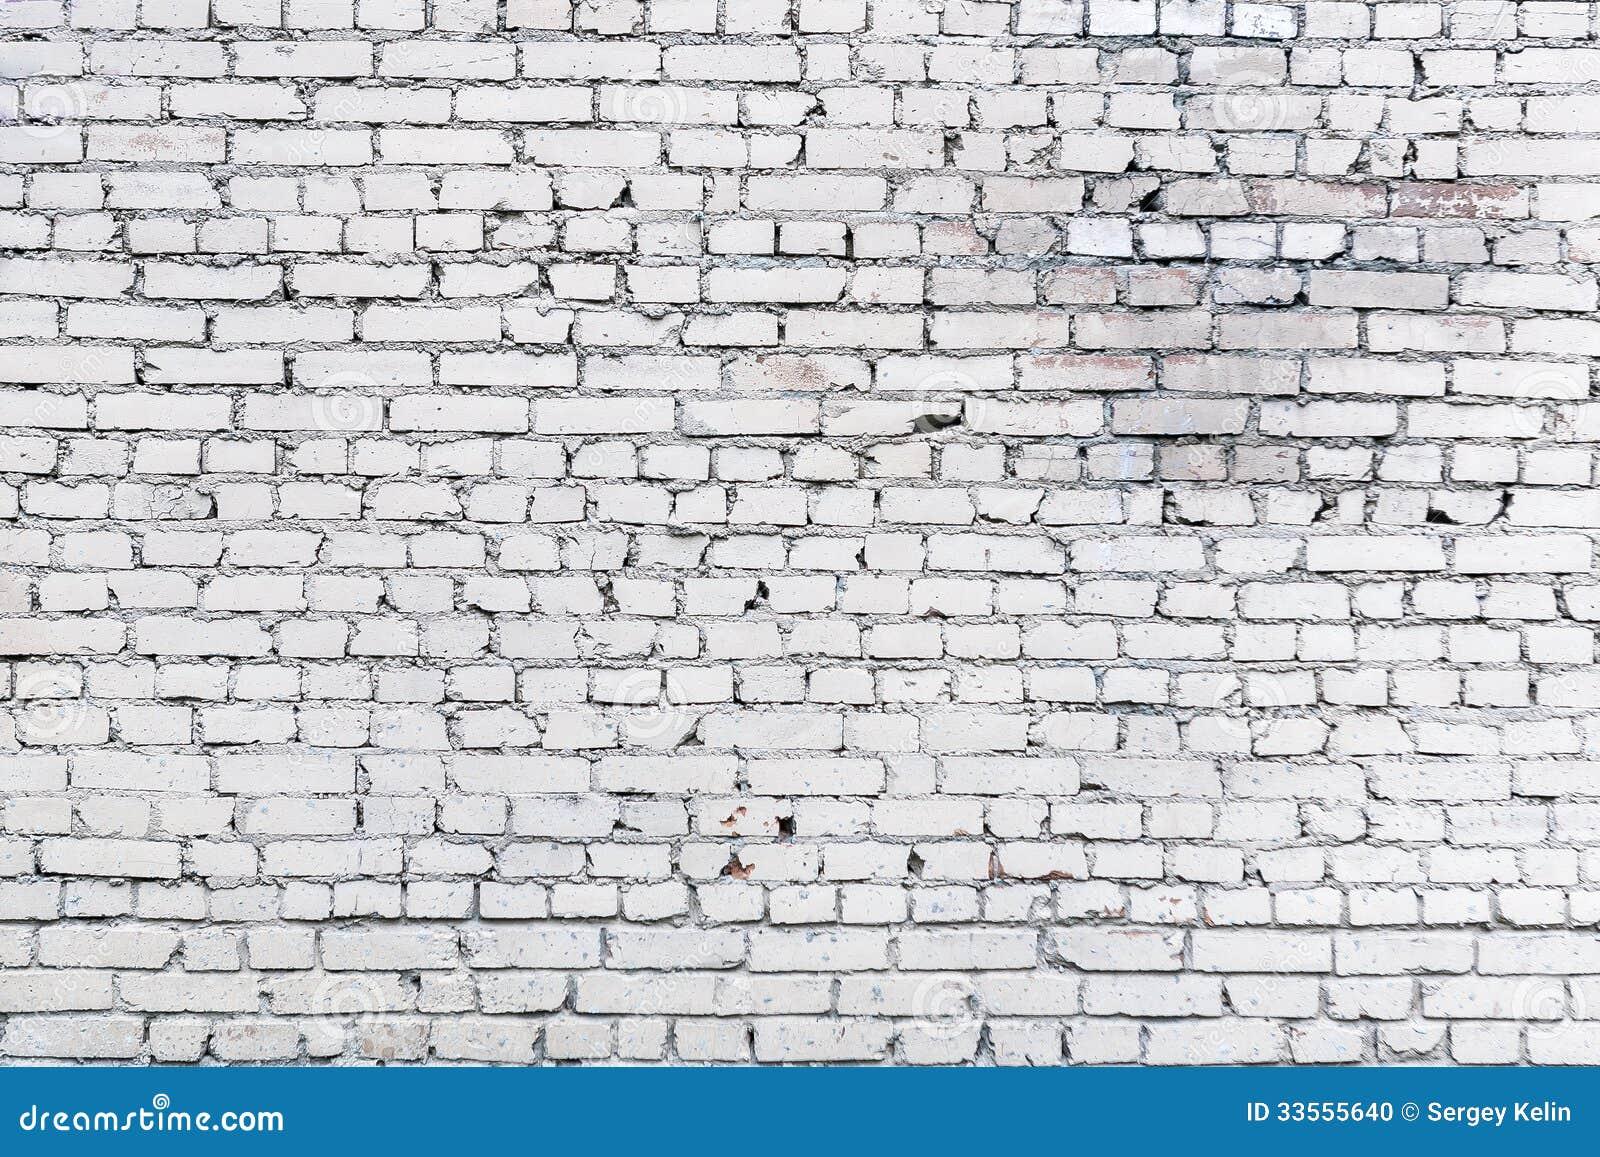 Fondo blanco de la pared de ladrillo foto de archivo - Pared ladrillo blanco ...